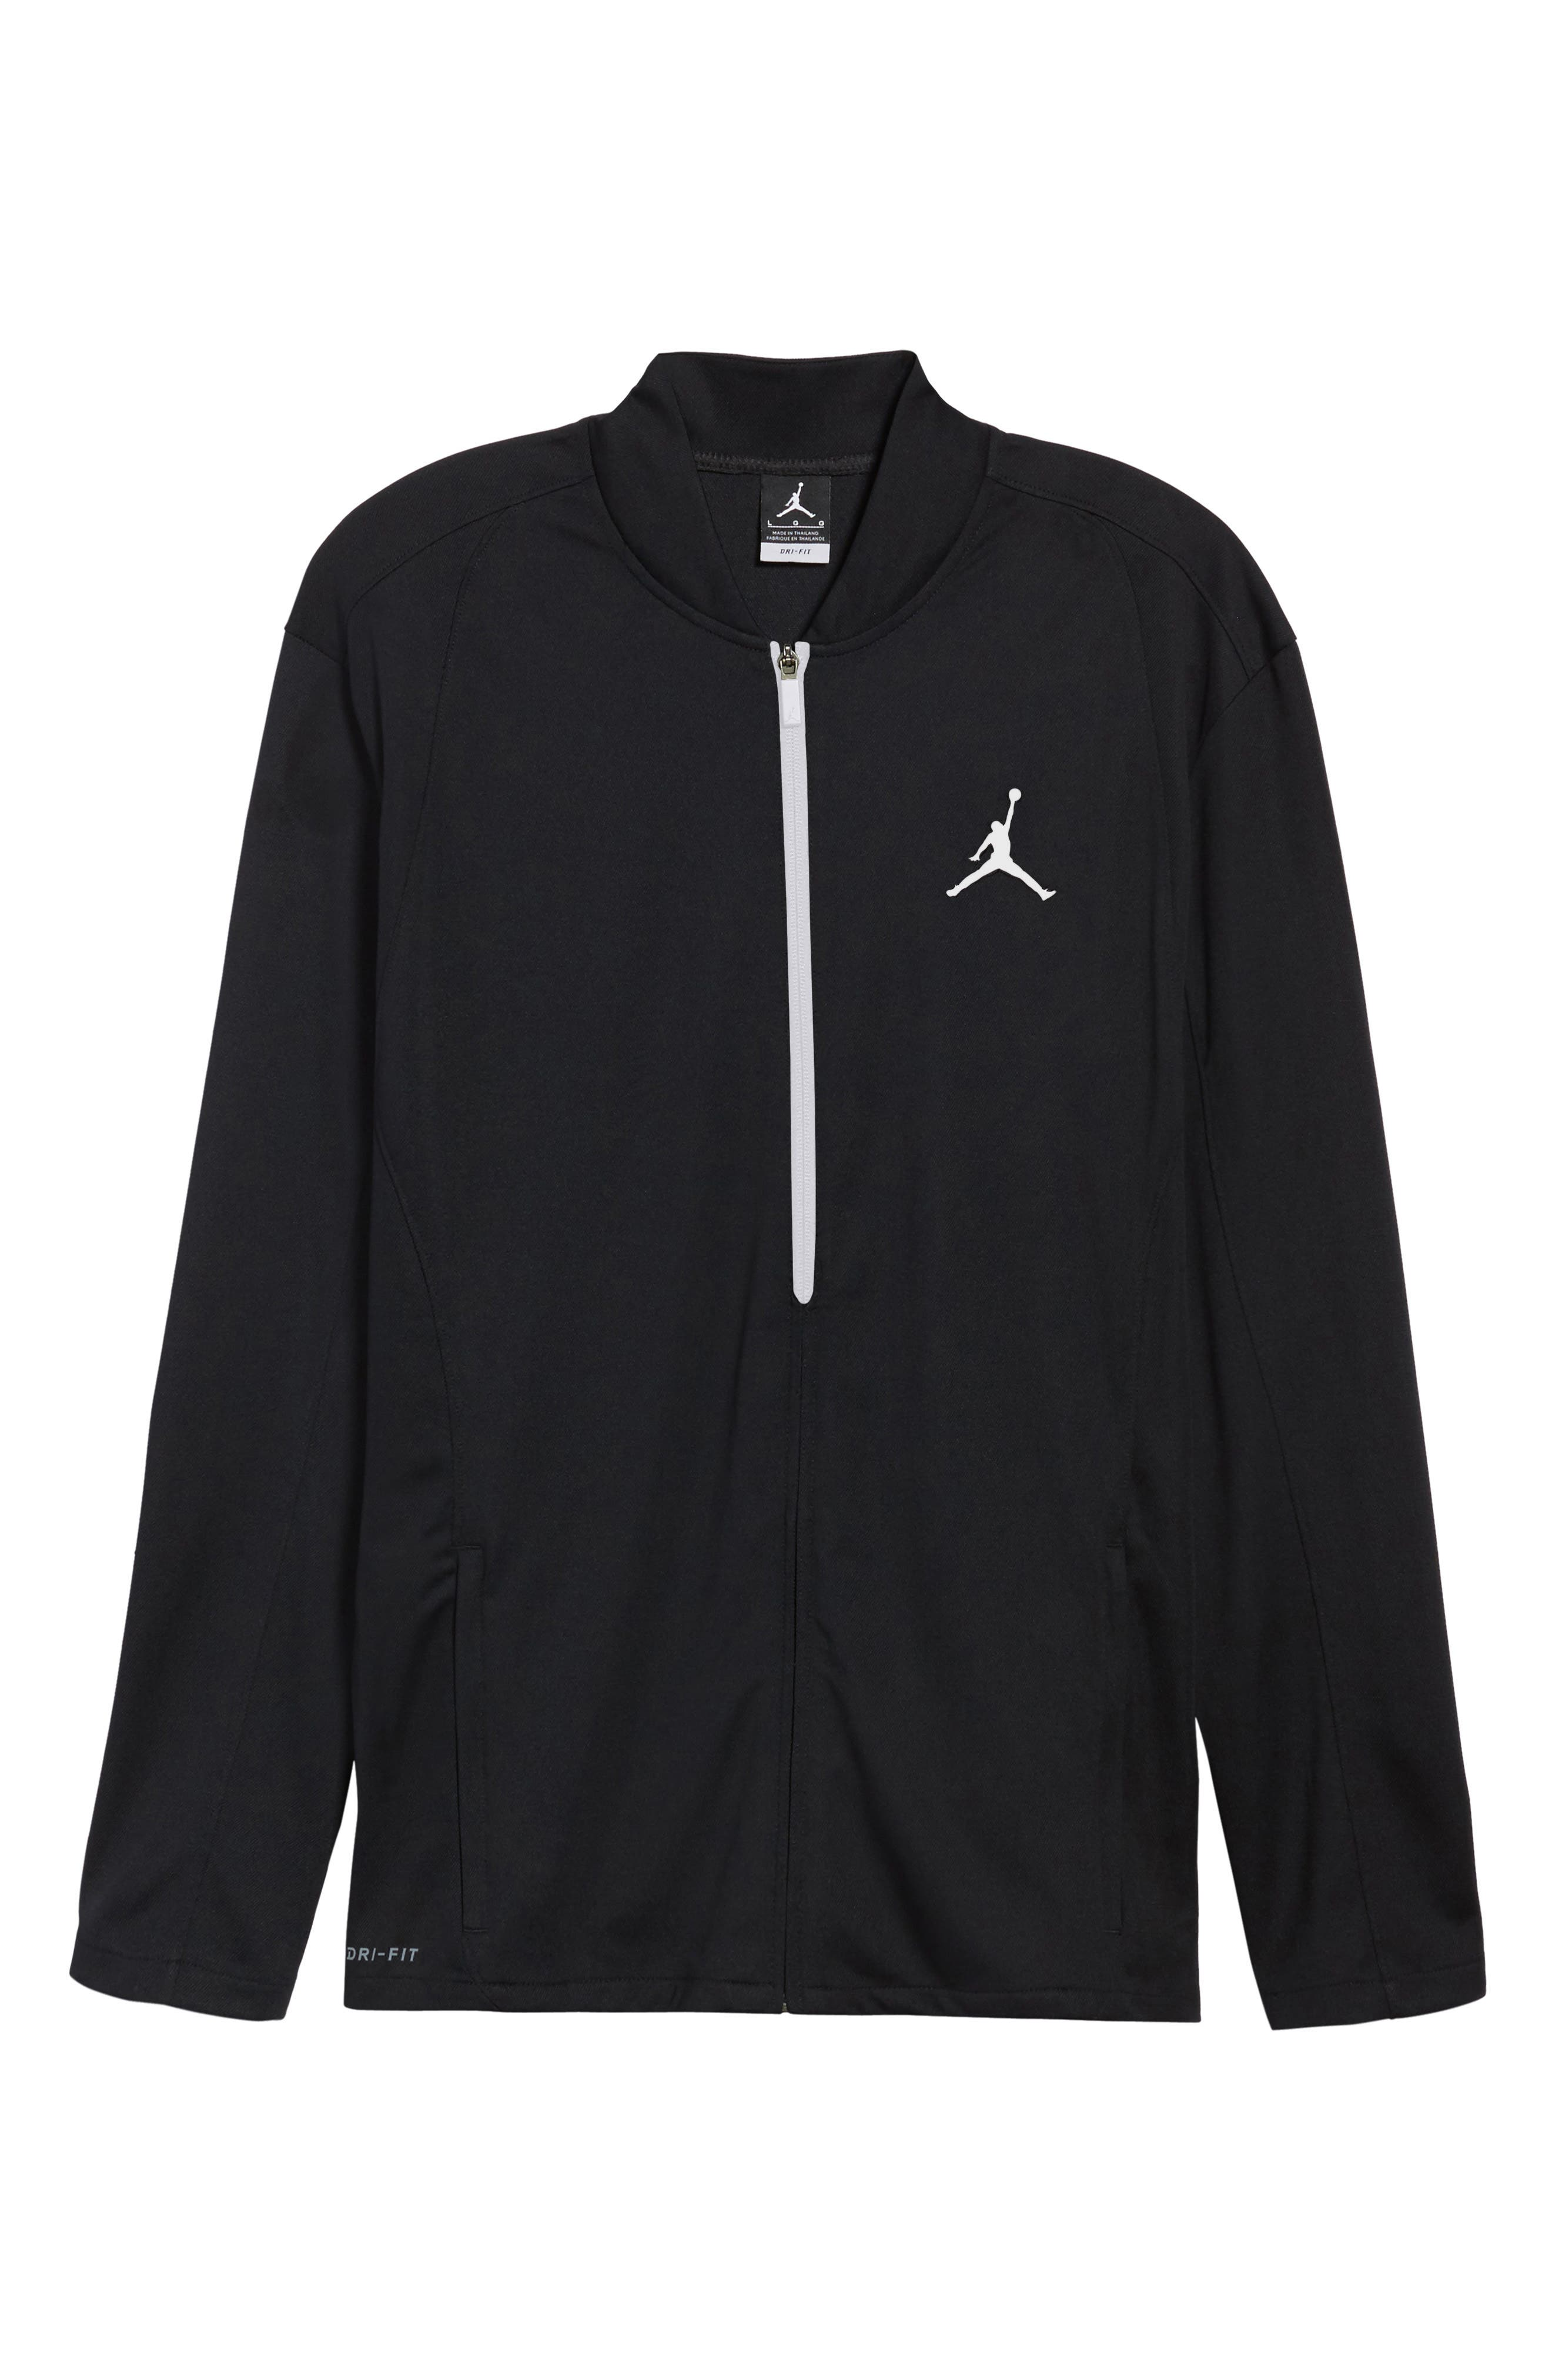 23 Alpha Dry Jacket,                             Alternate thumbnail 5, color,                             Black/ White